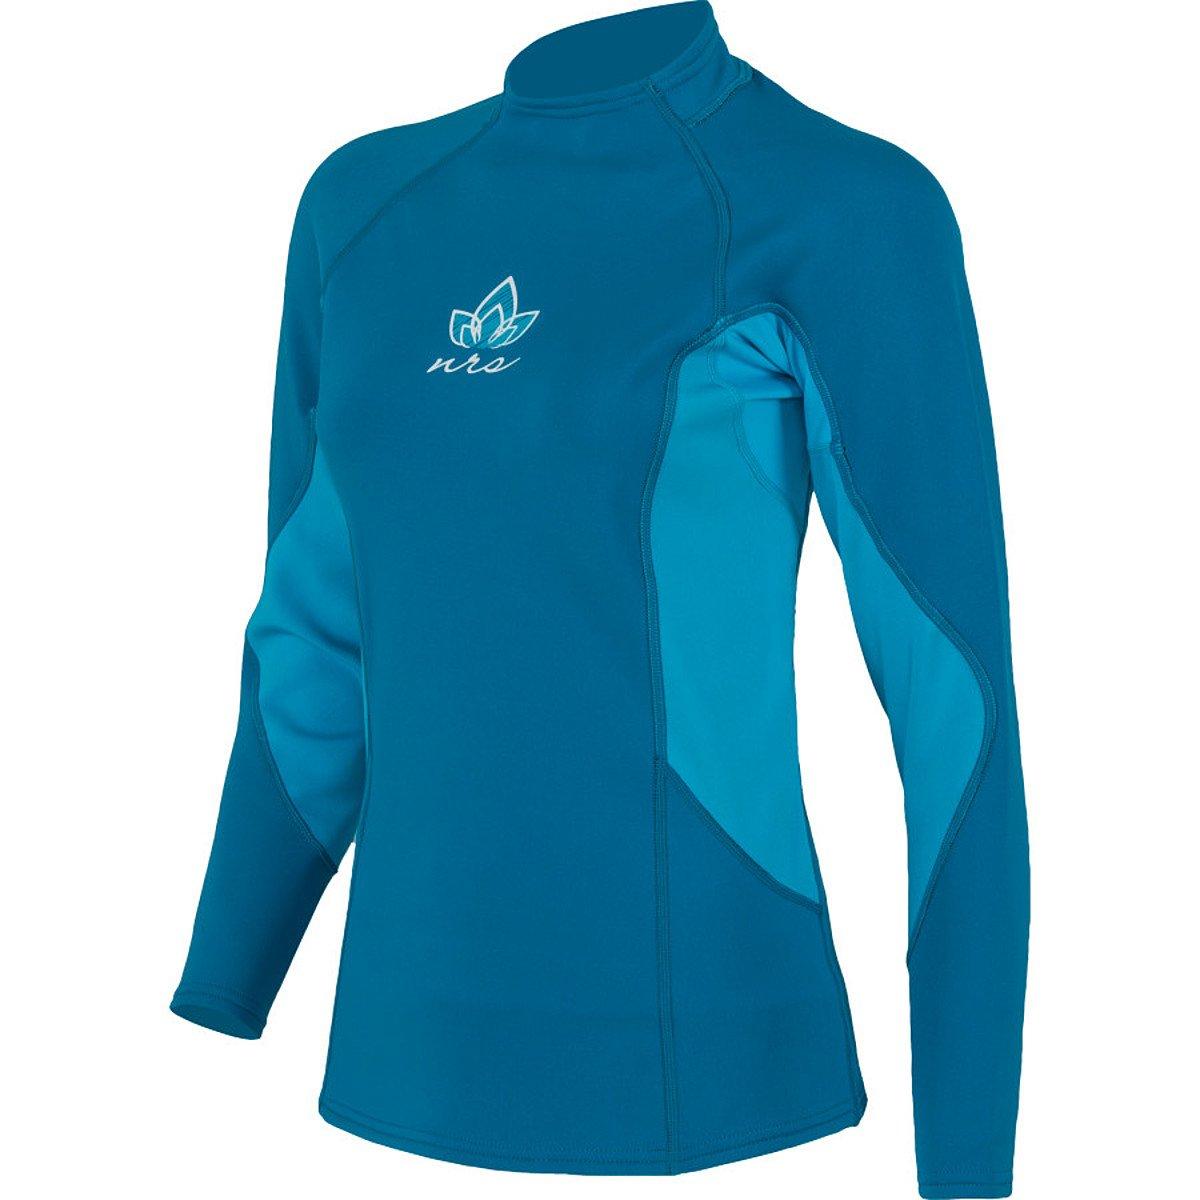 NRS HydroSkin 0.5 LS Shirt - Women's Dark Ocean XS by NRS